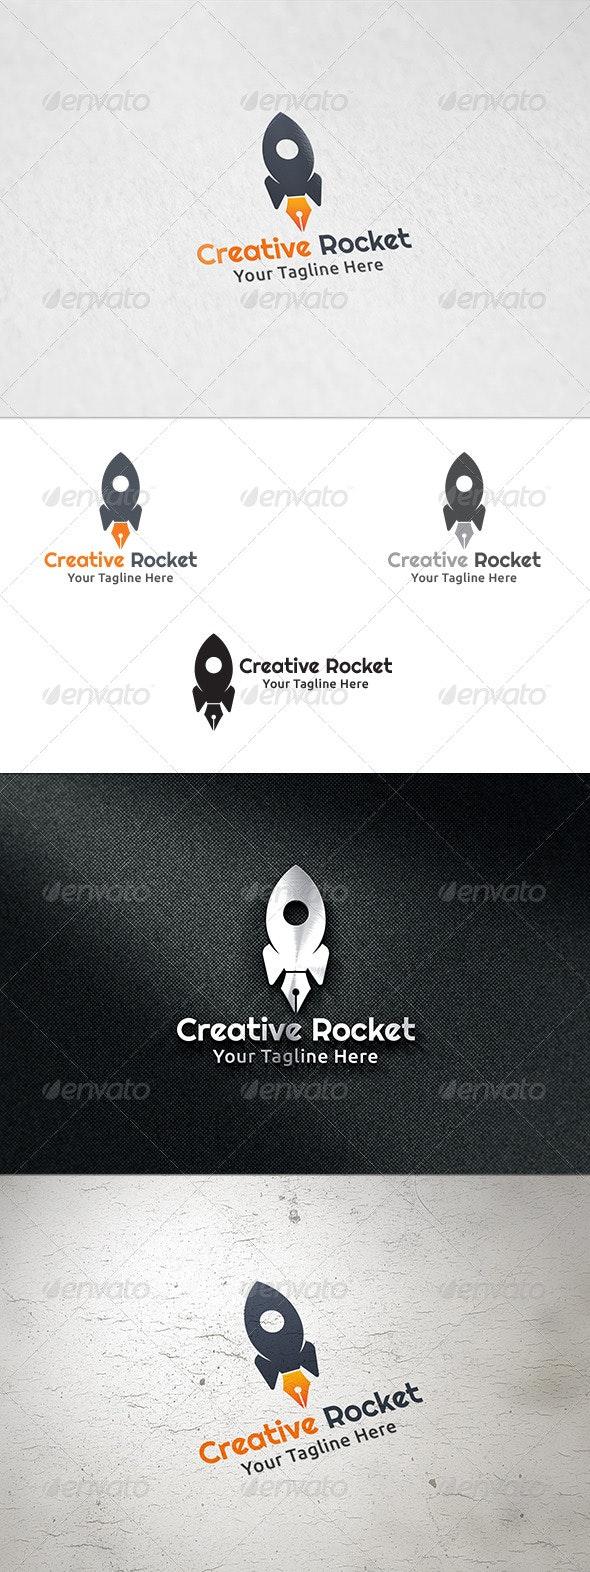 Creative Rocket - Logo Template - Objects Logo Templates